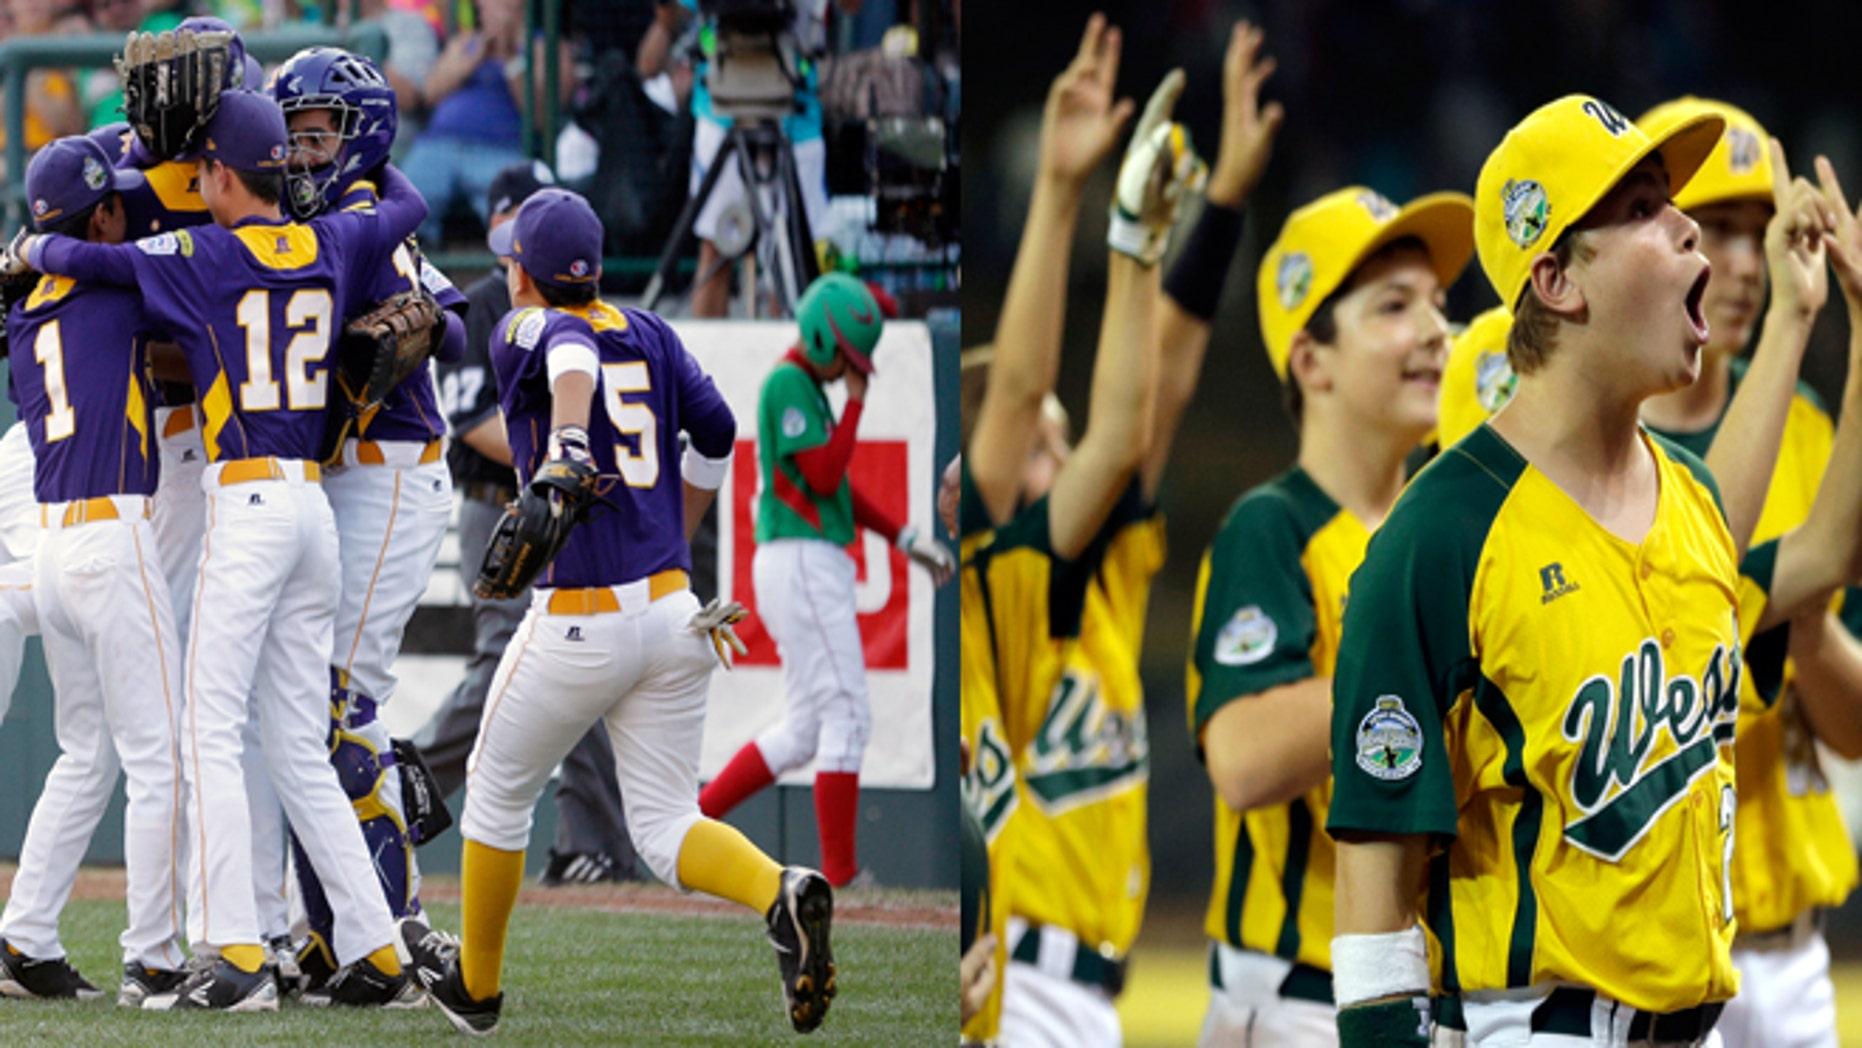 Panama celebrates a win (left) and California celebrates a win (right) on Thursday night.  (AP)